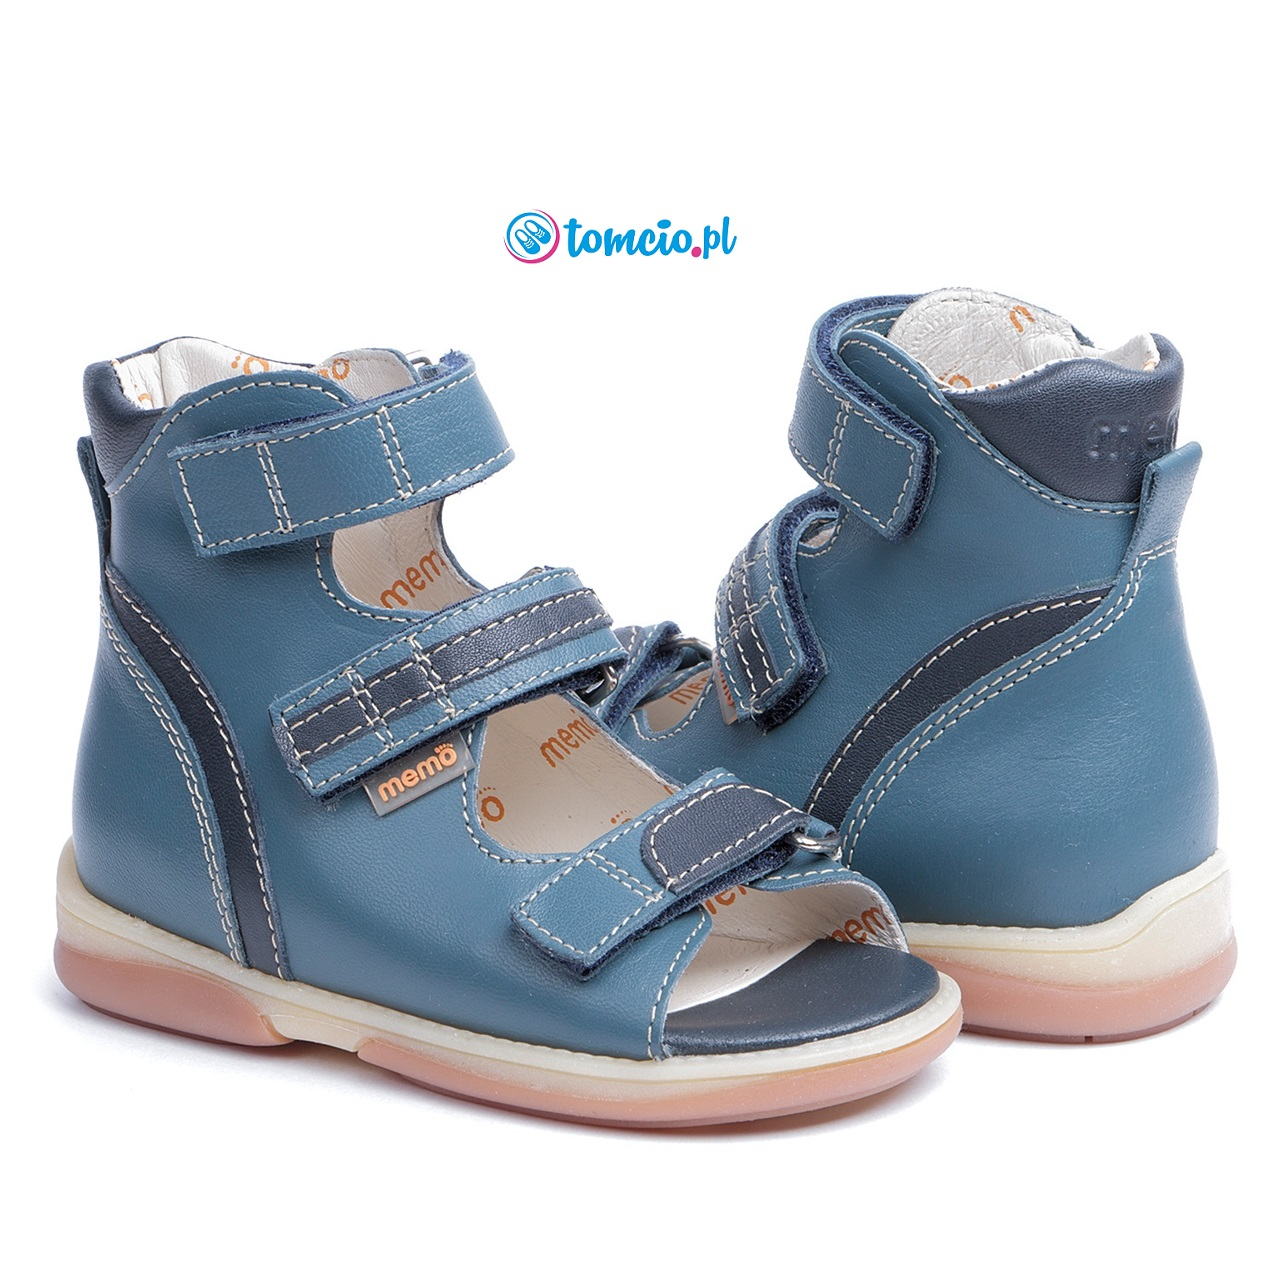 04e753166bfc4 Virtus buty memo Buty memo virtus 3CH profilaktyczne buty memo memo obuwie  korekcyjne ...